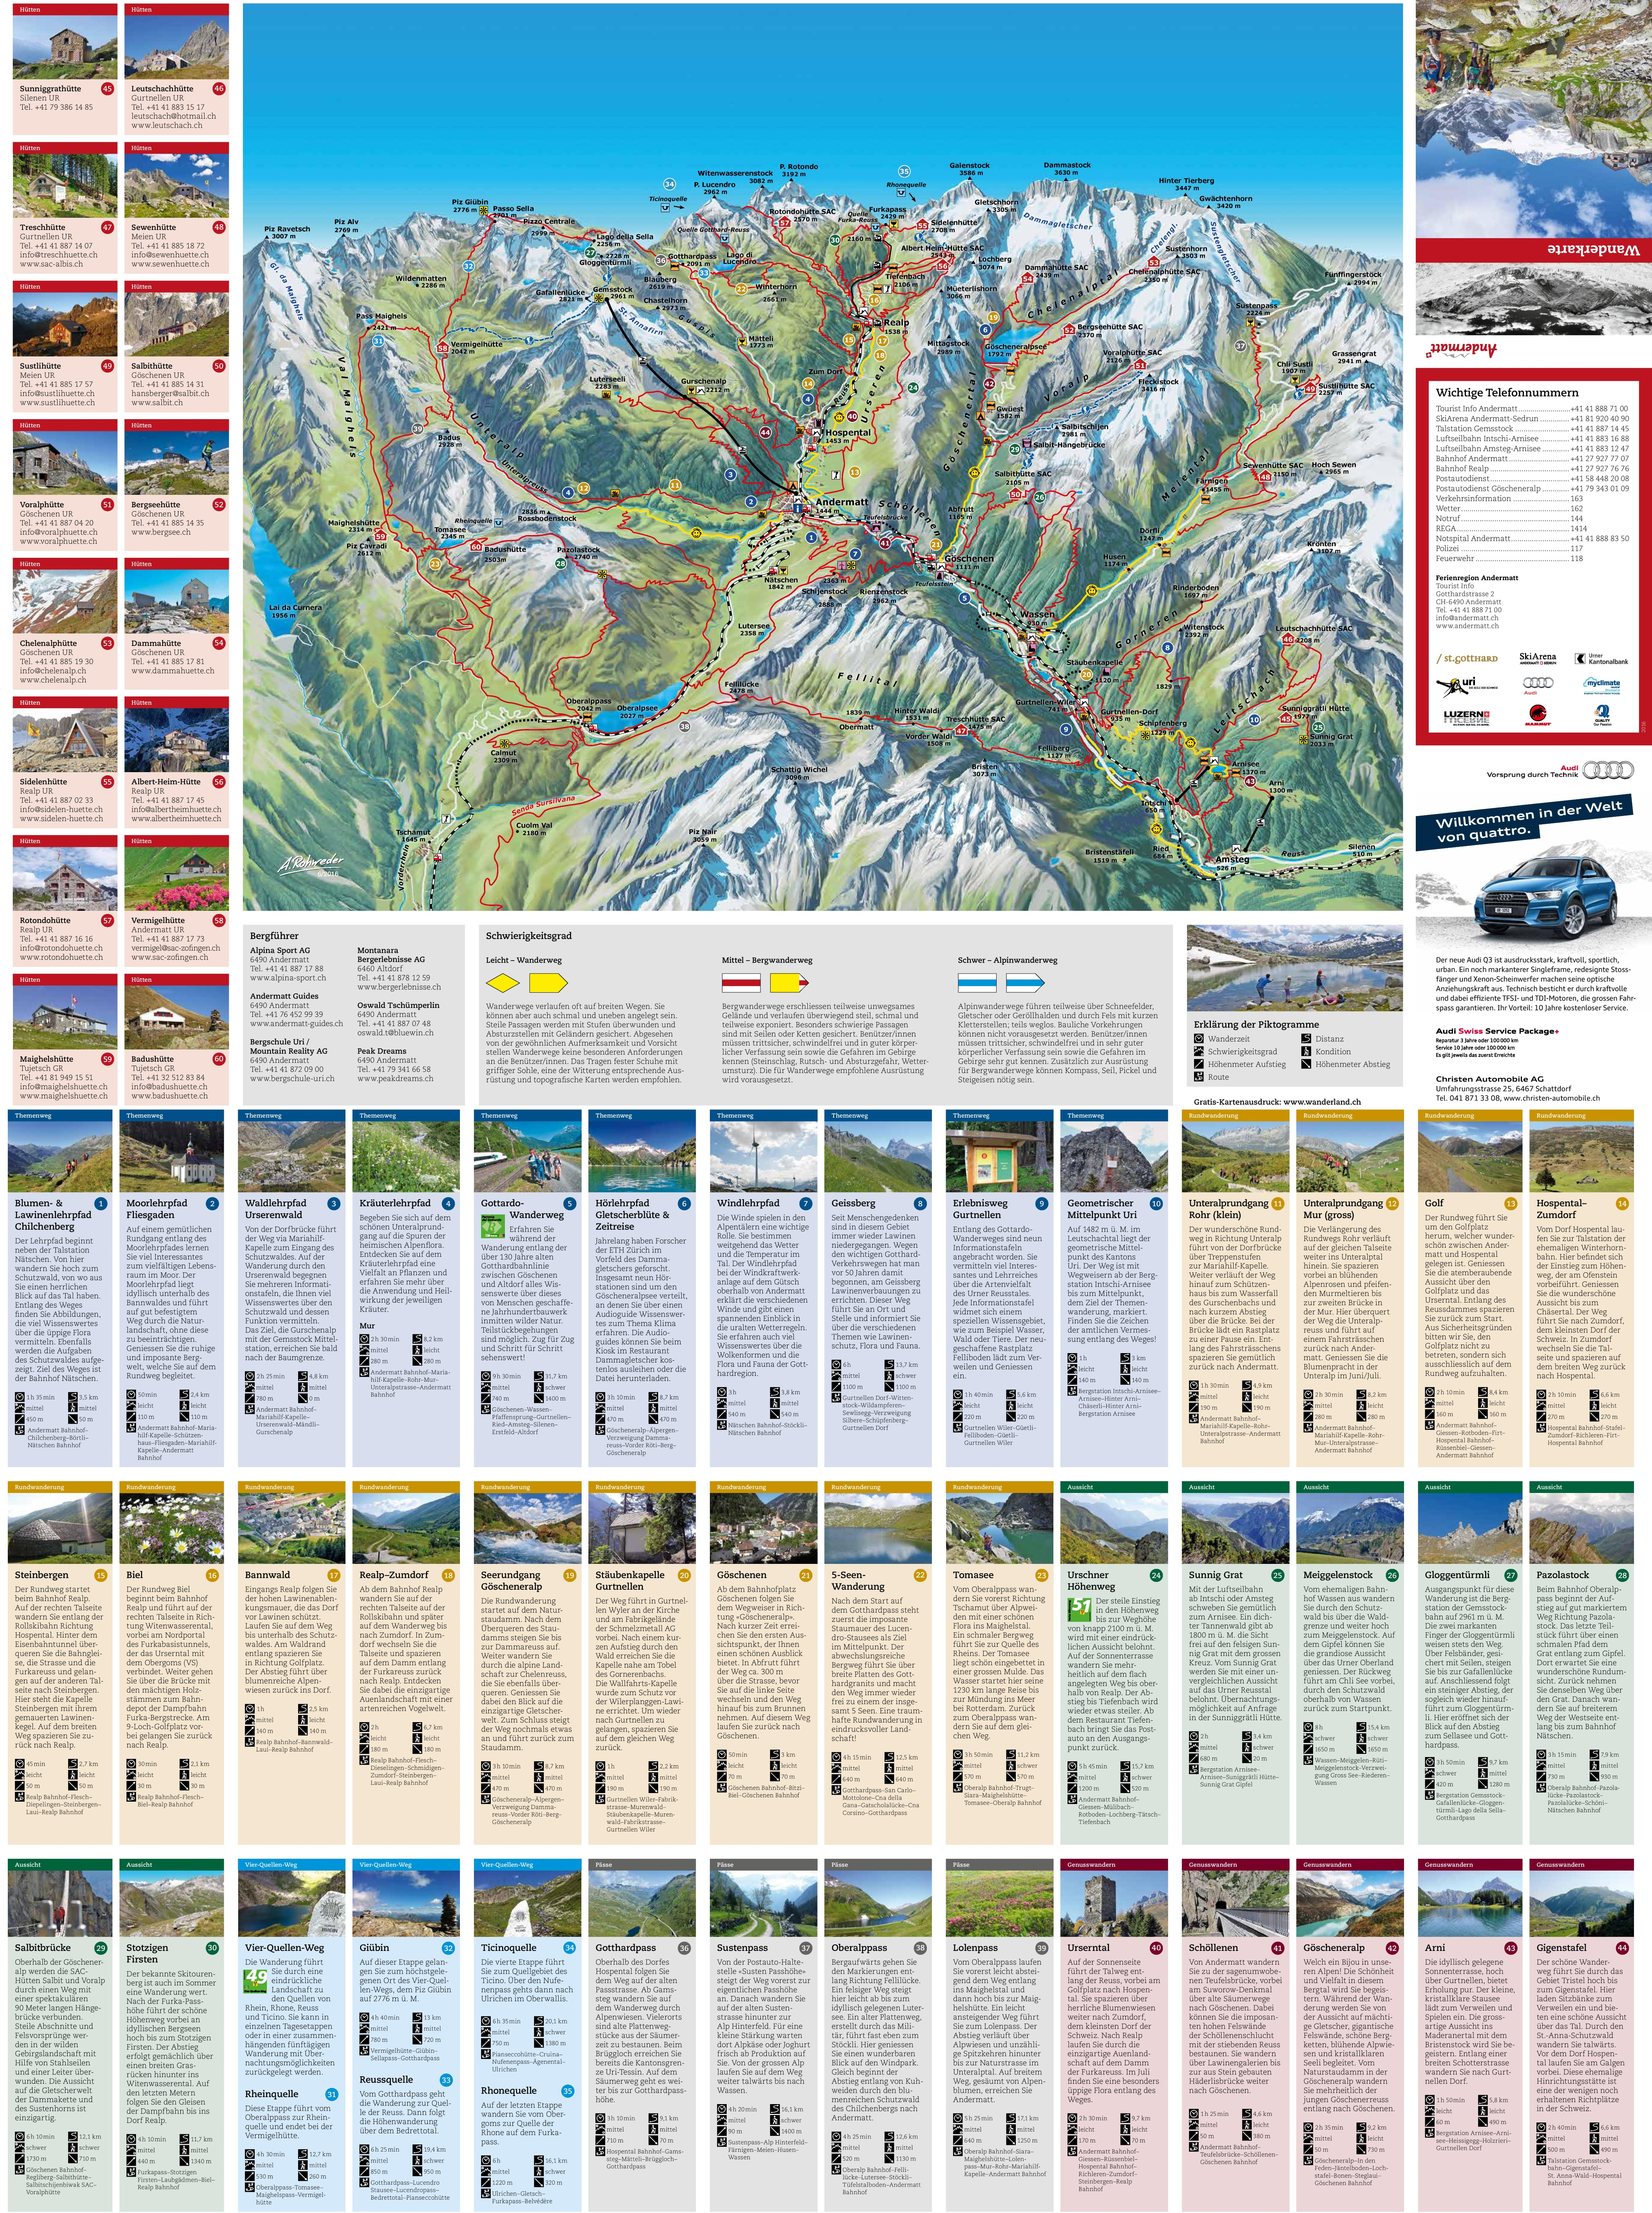 Andermatt trail map